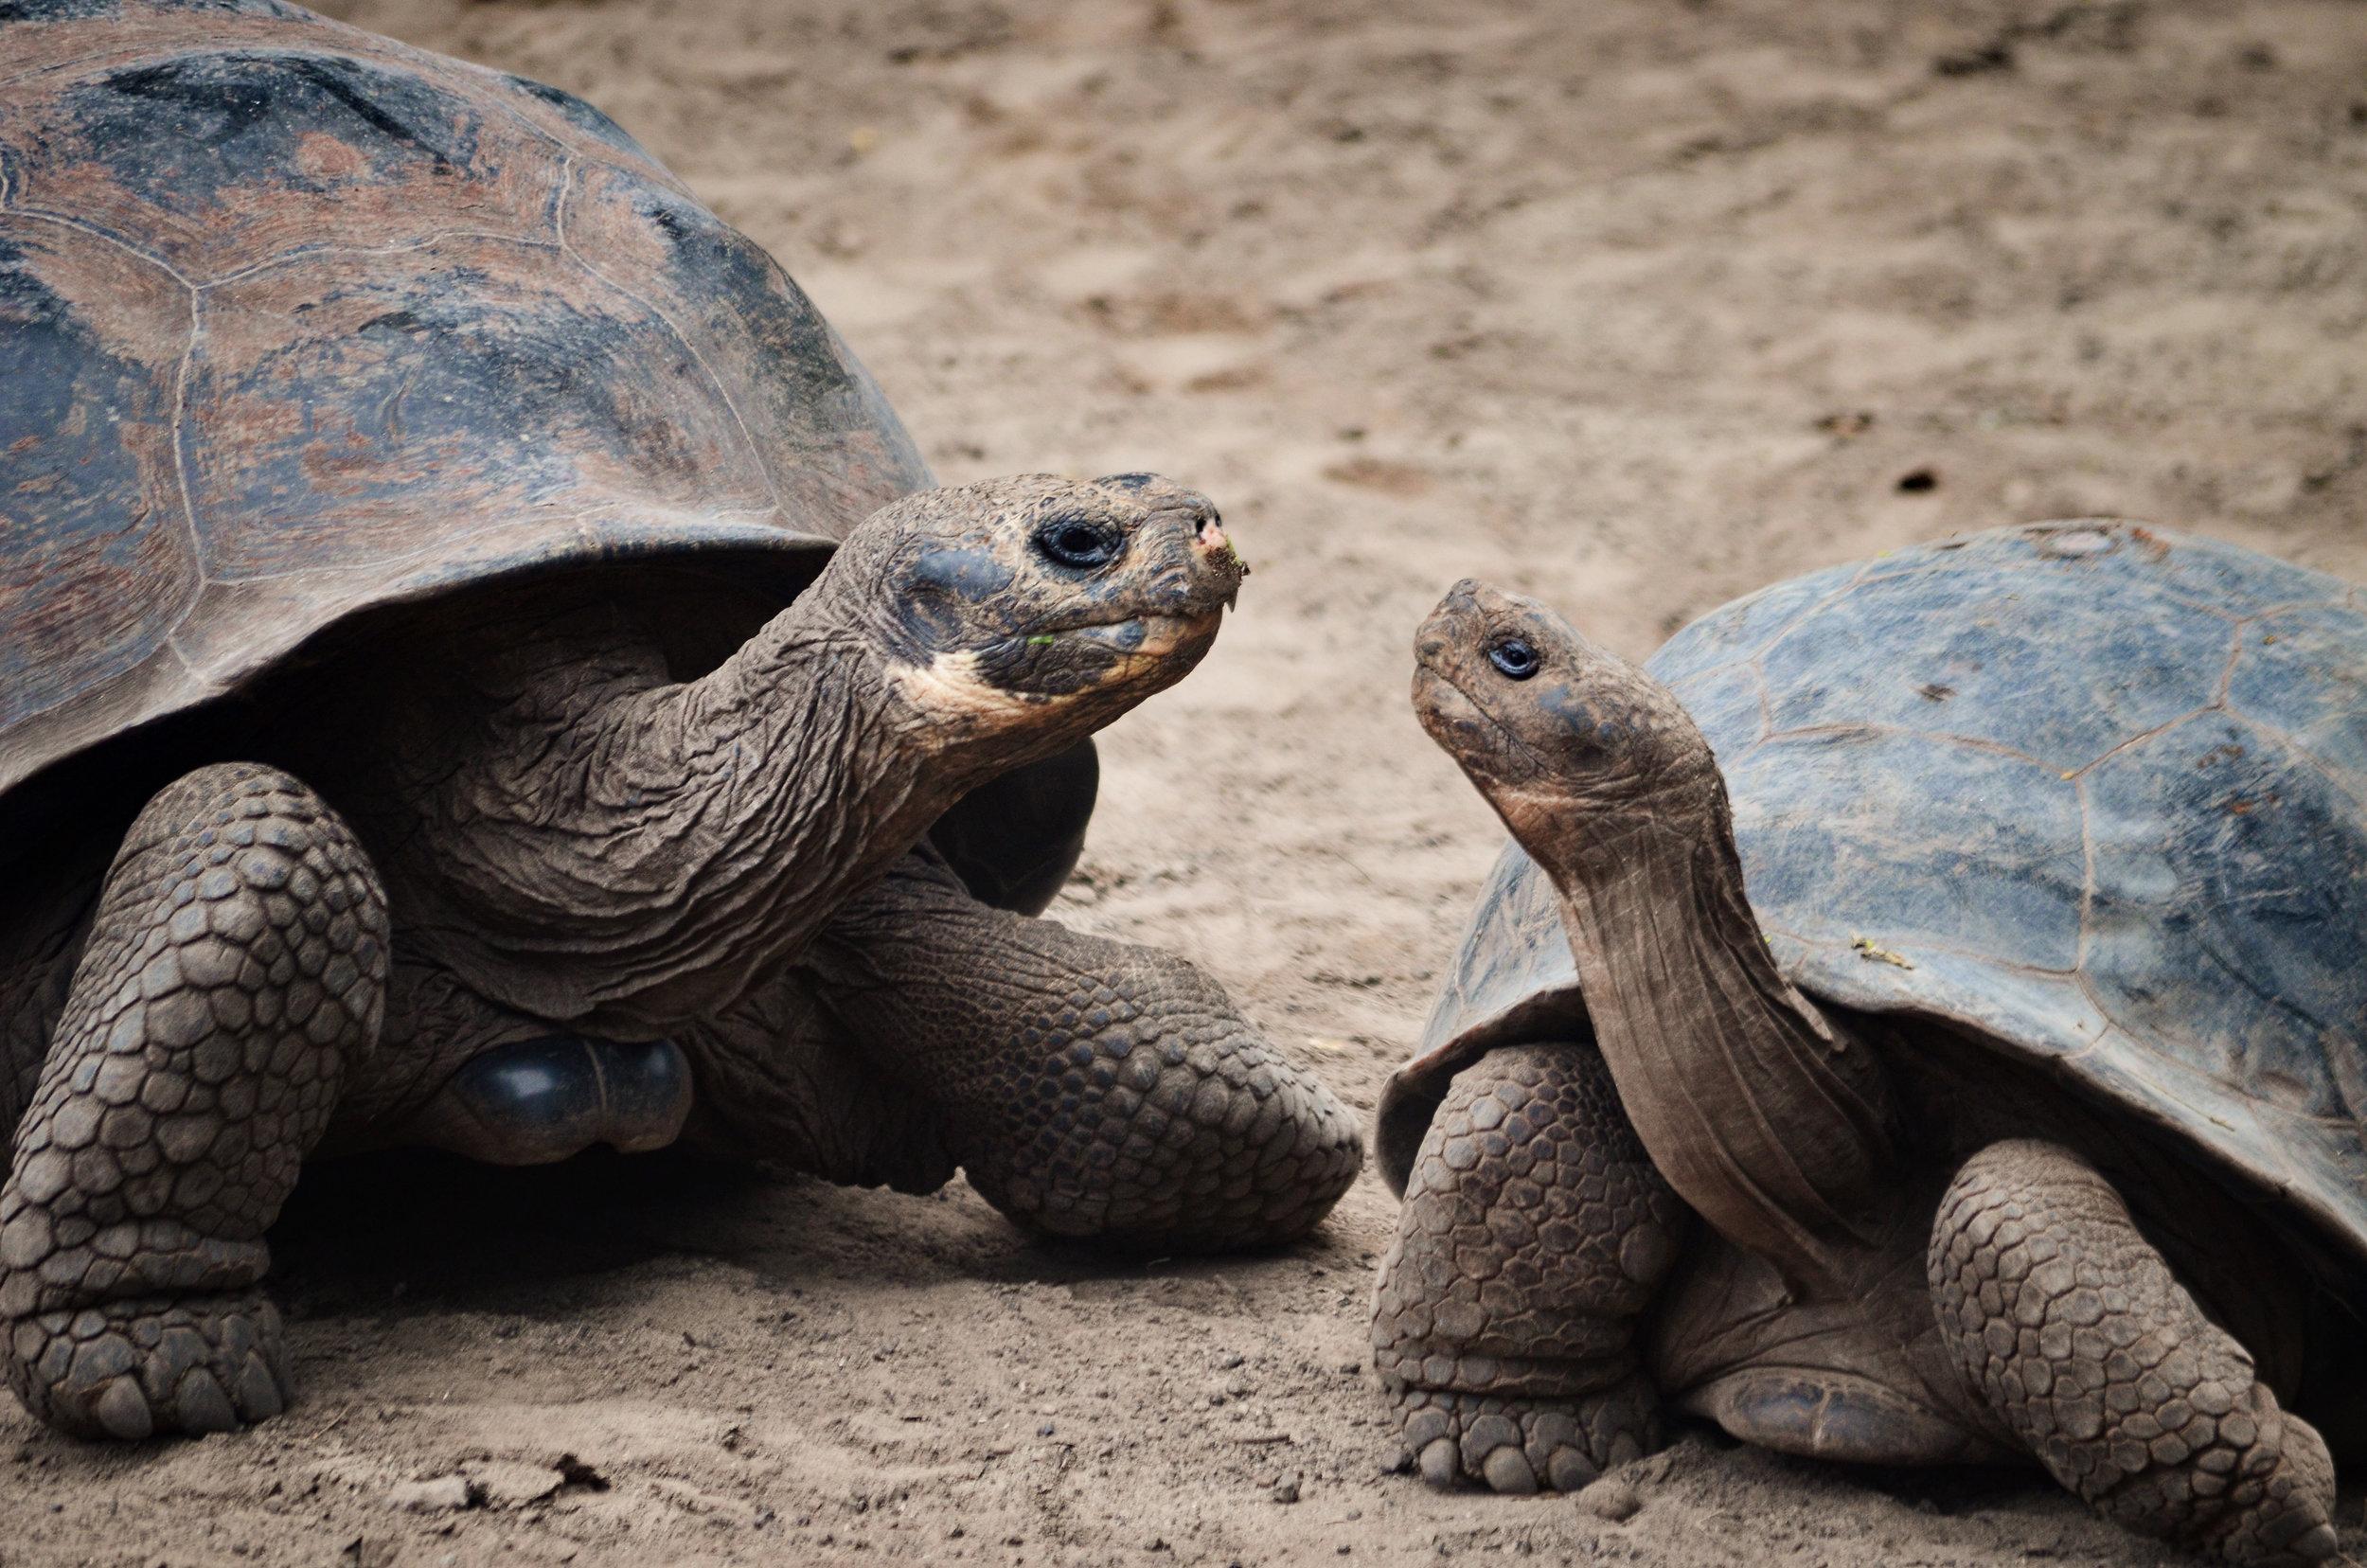 Two giant tortoises pose at the breeding center on Isabela Island